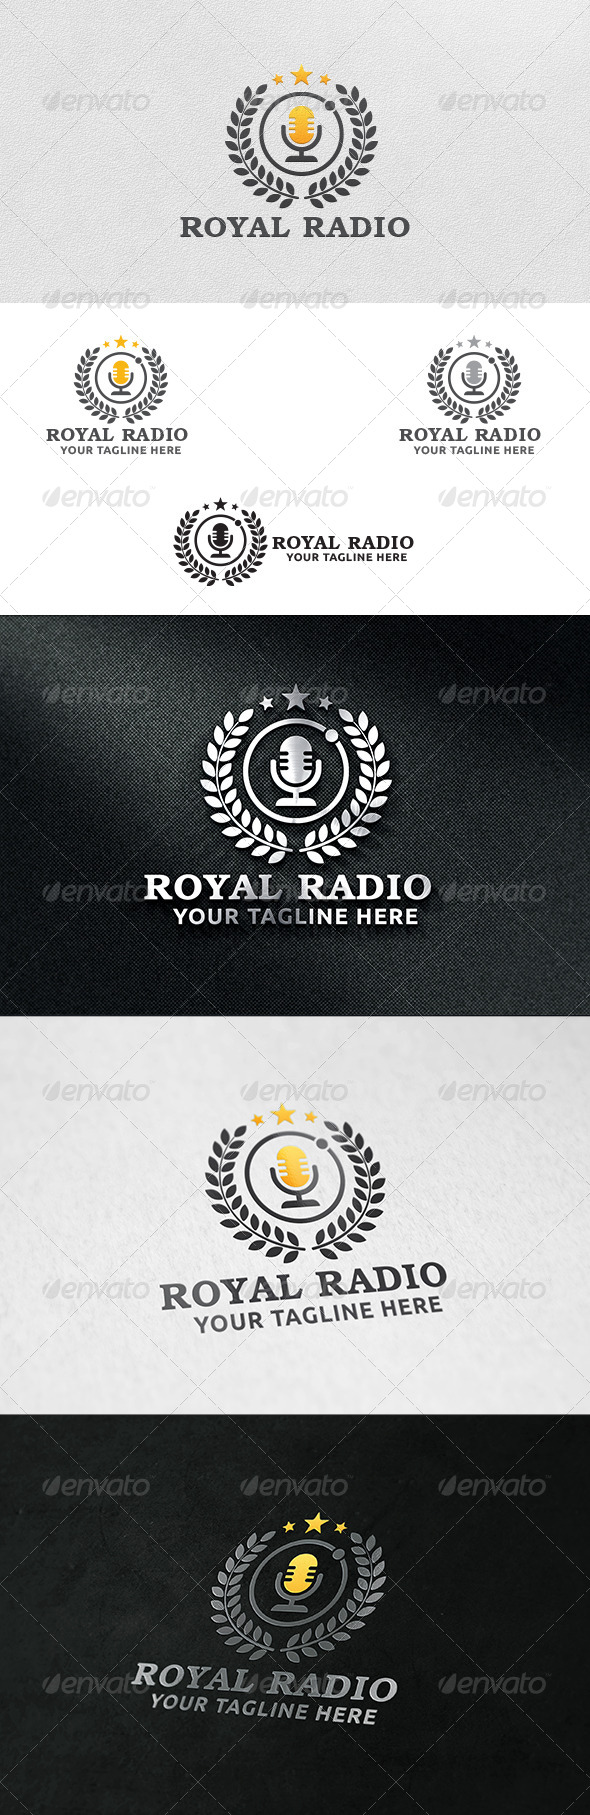 Royal Radio - Logo Template - Crests Logo Templates